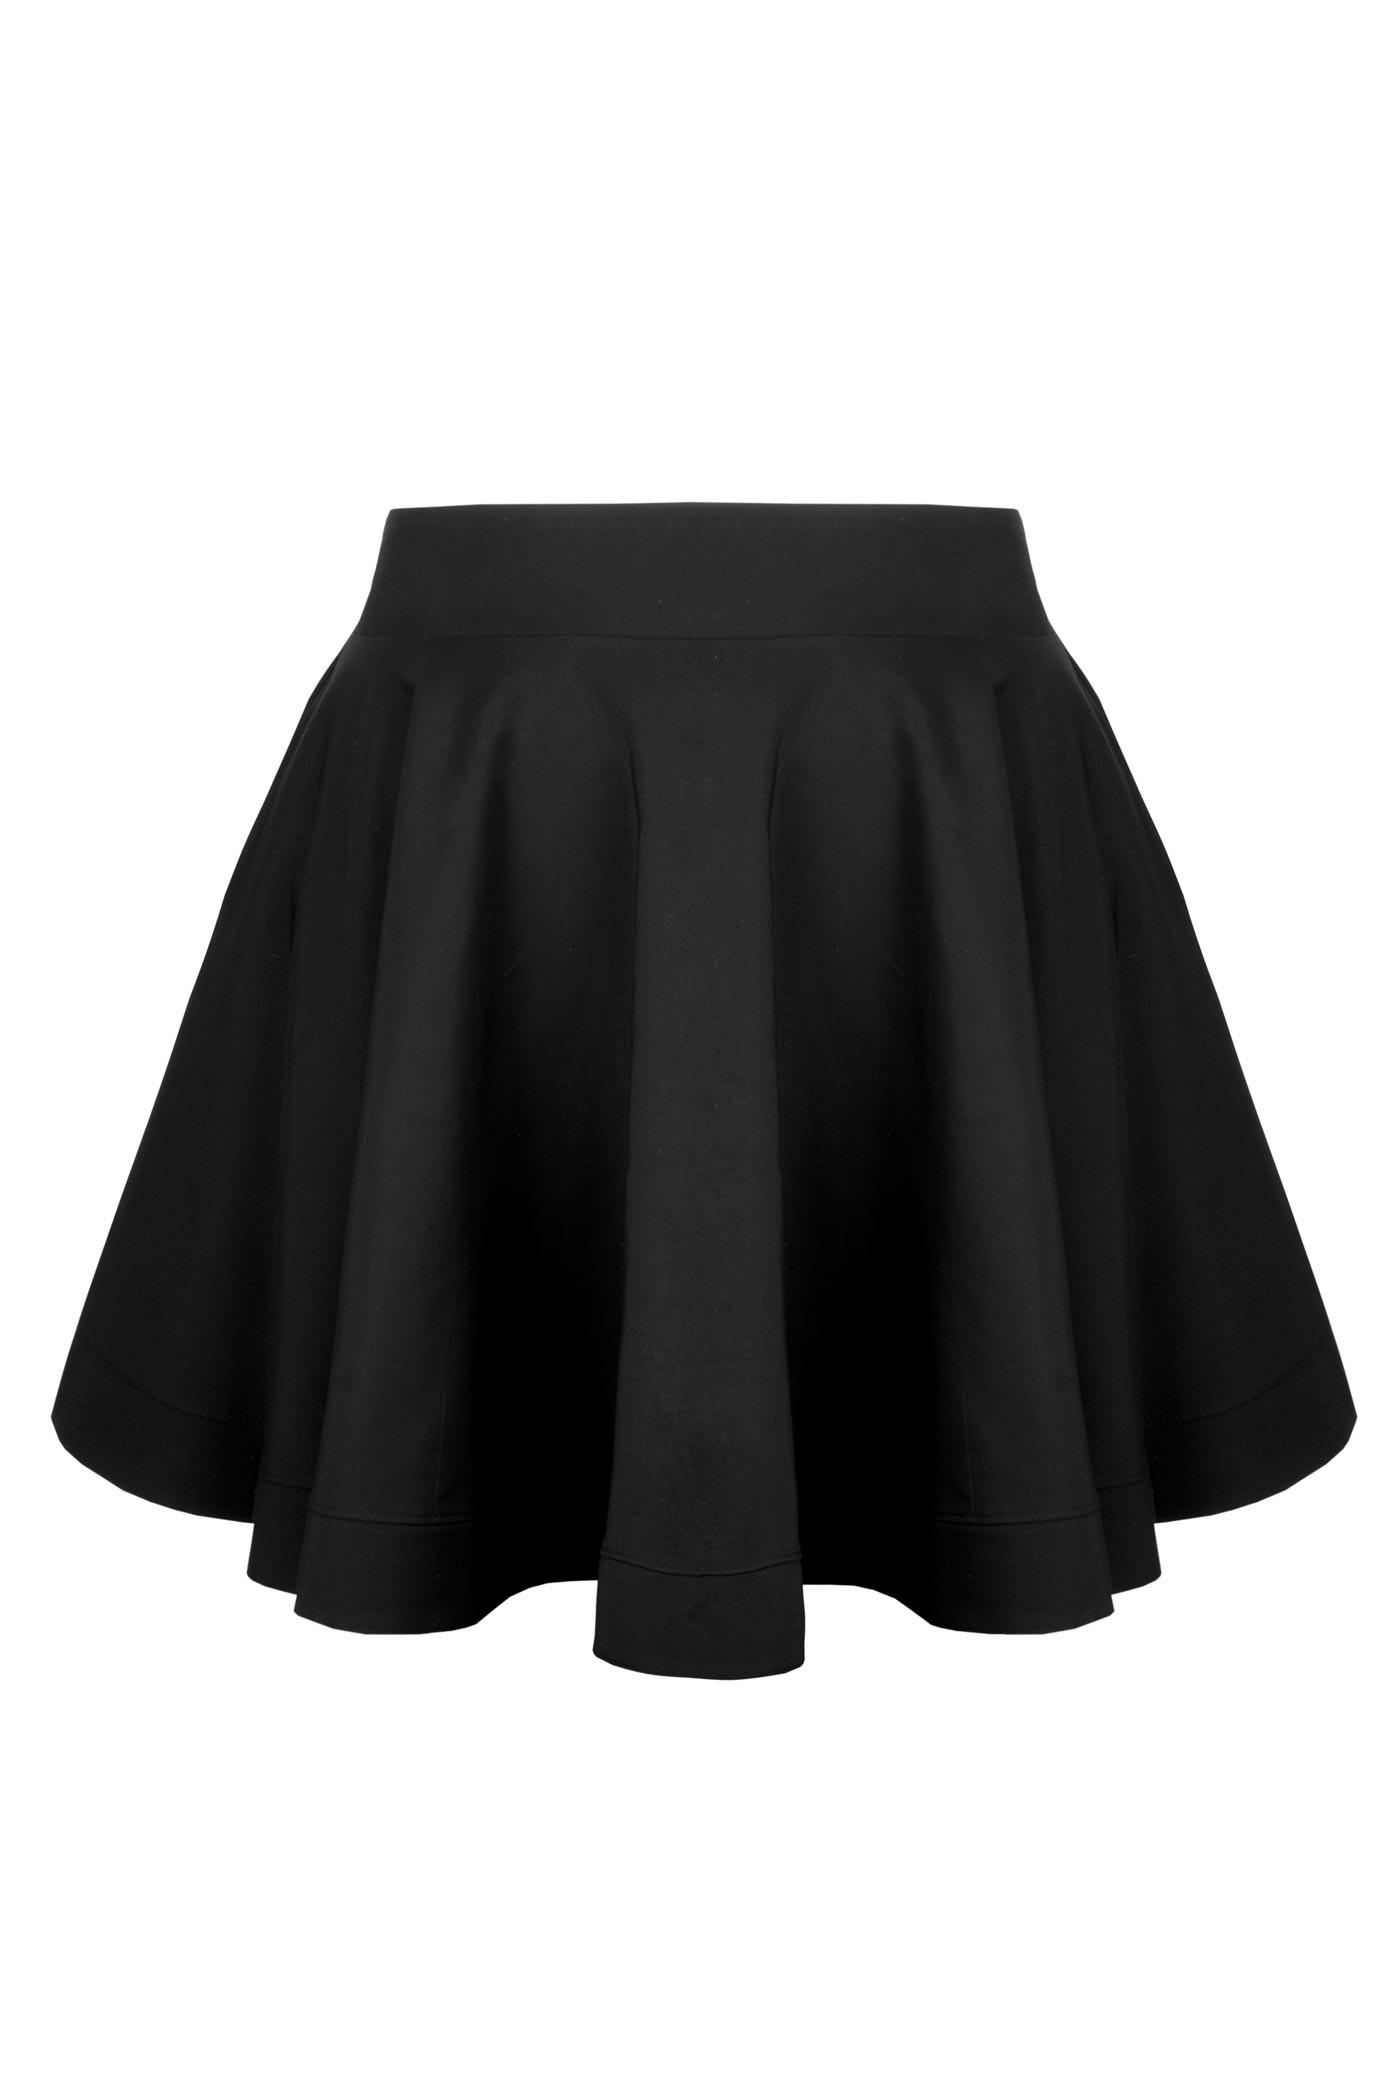 HESSA BLACK elegancka spódnica plus size